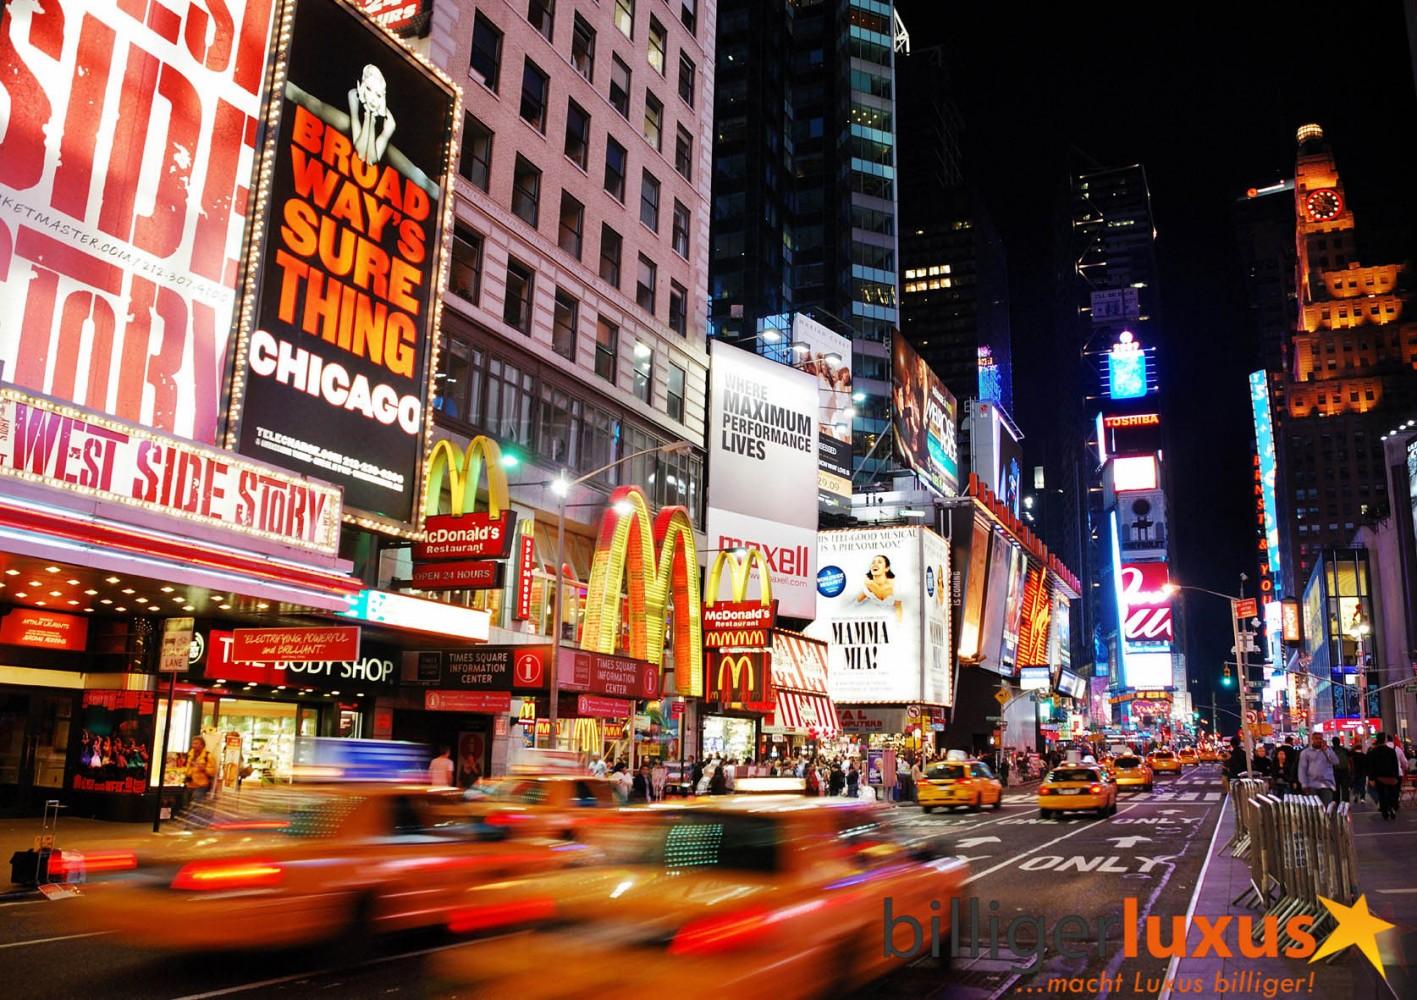 Wall Mural Wallpaper New York Broadway Taxi Yellow Cap Night Photo 360 Cm X 254 Cm 3 94 Yd X 2 78 Yd